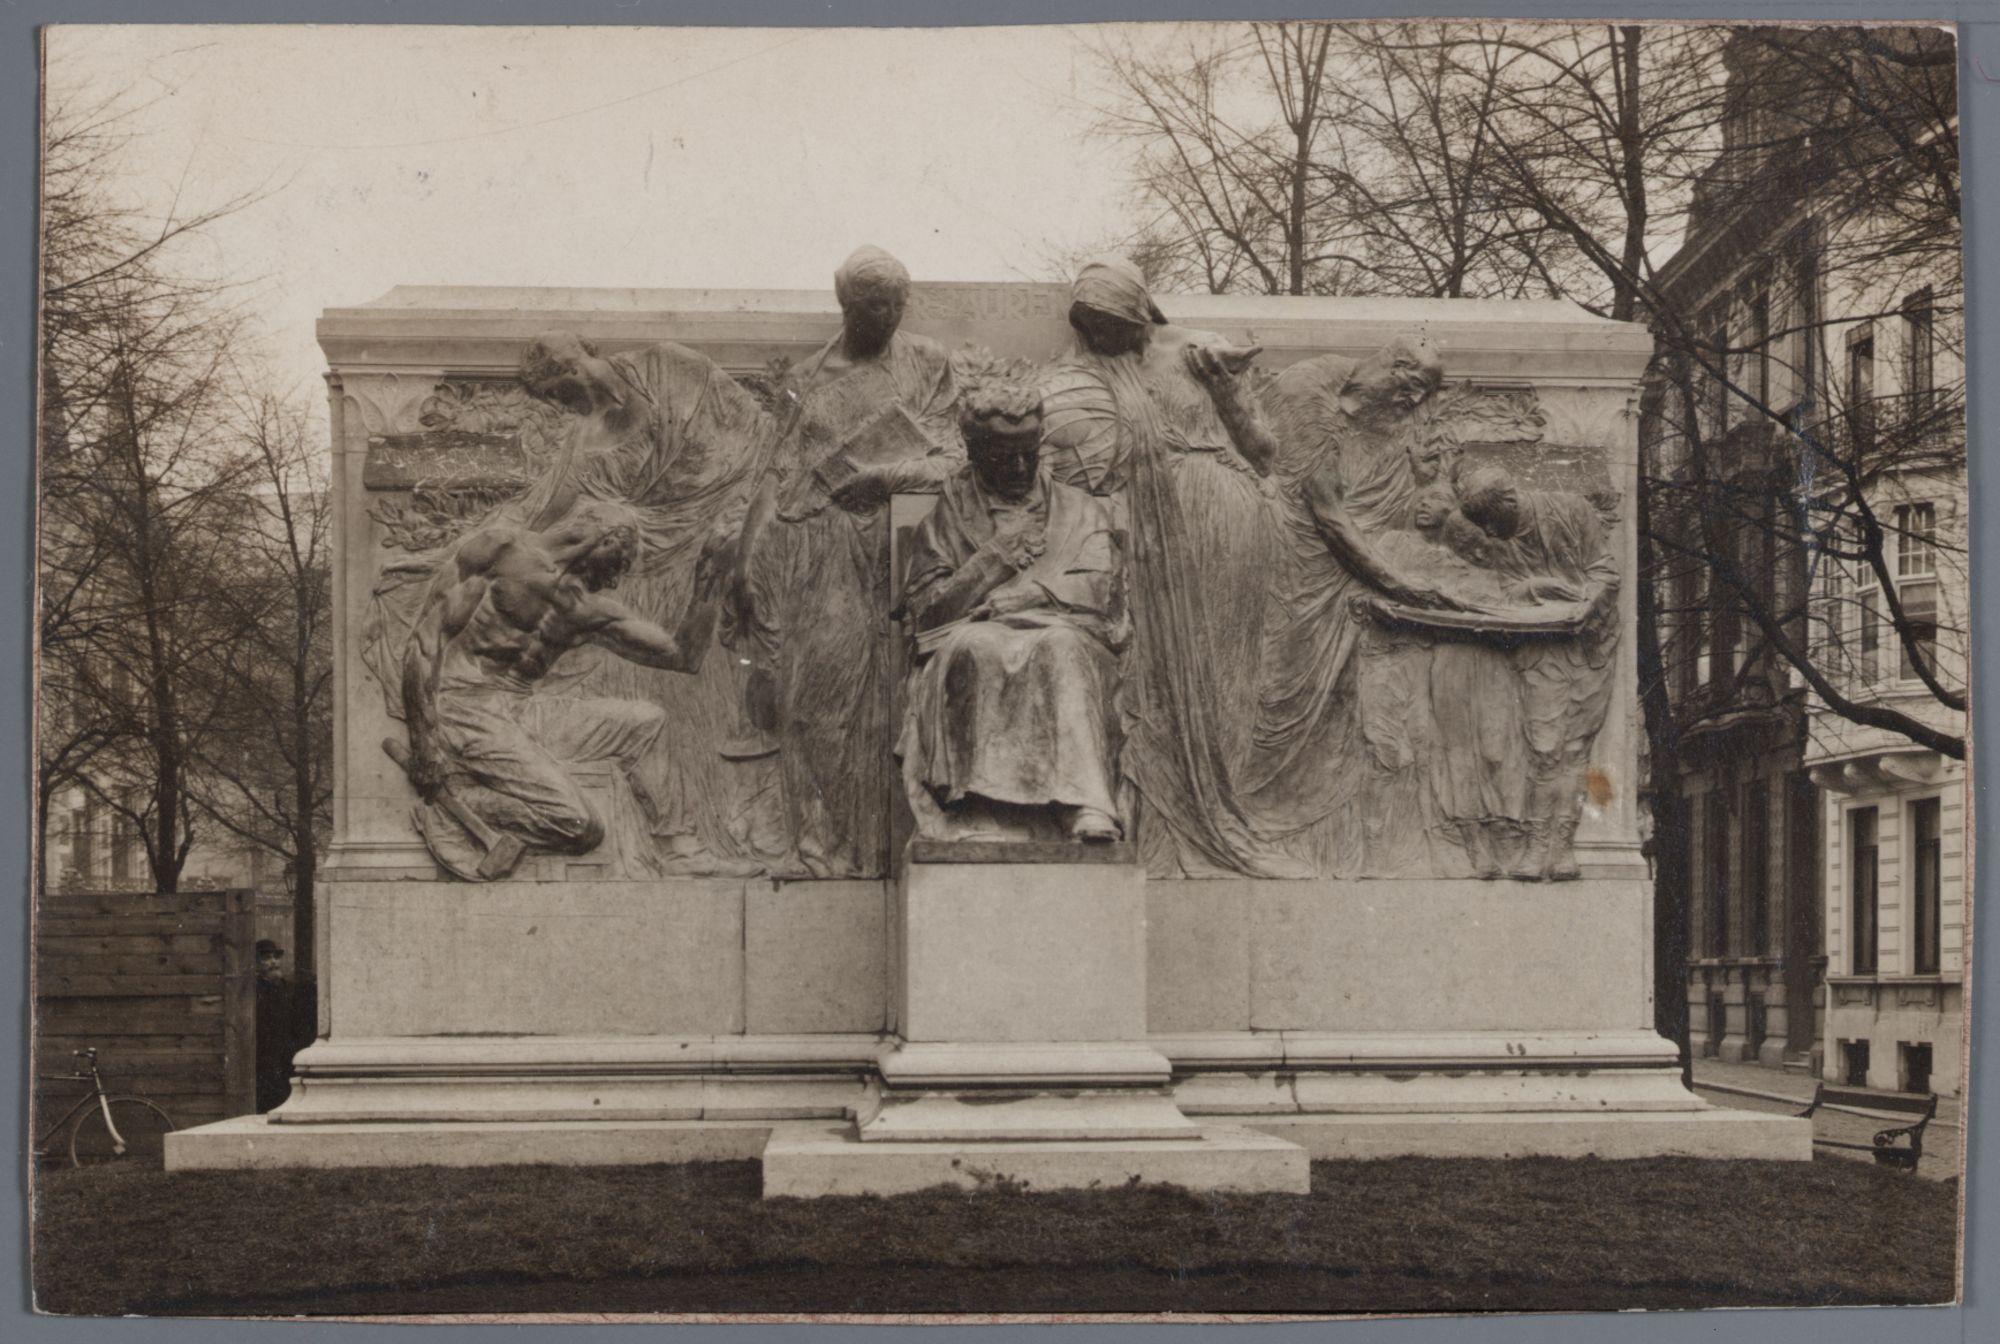 Gent: Monument voor François Laurent